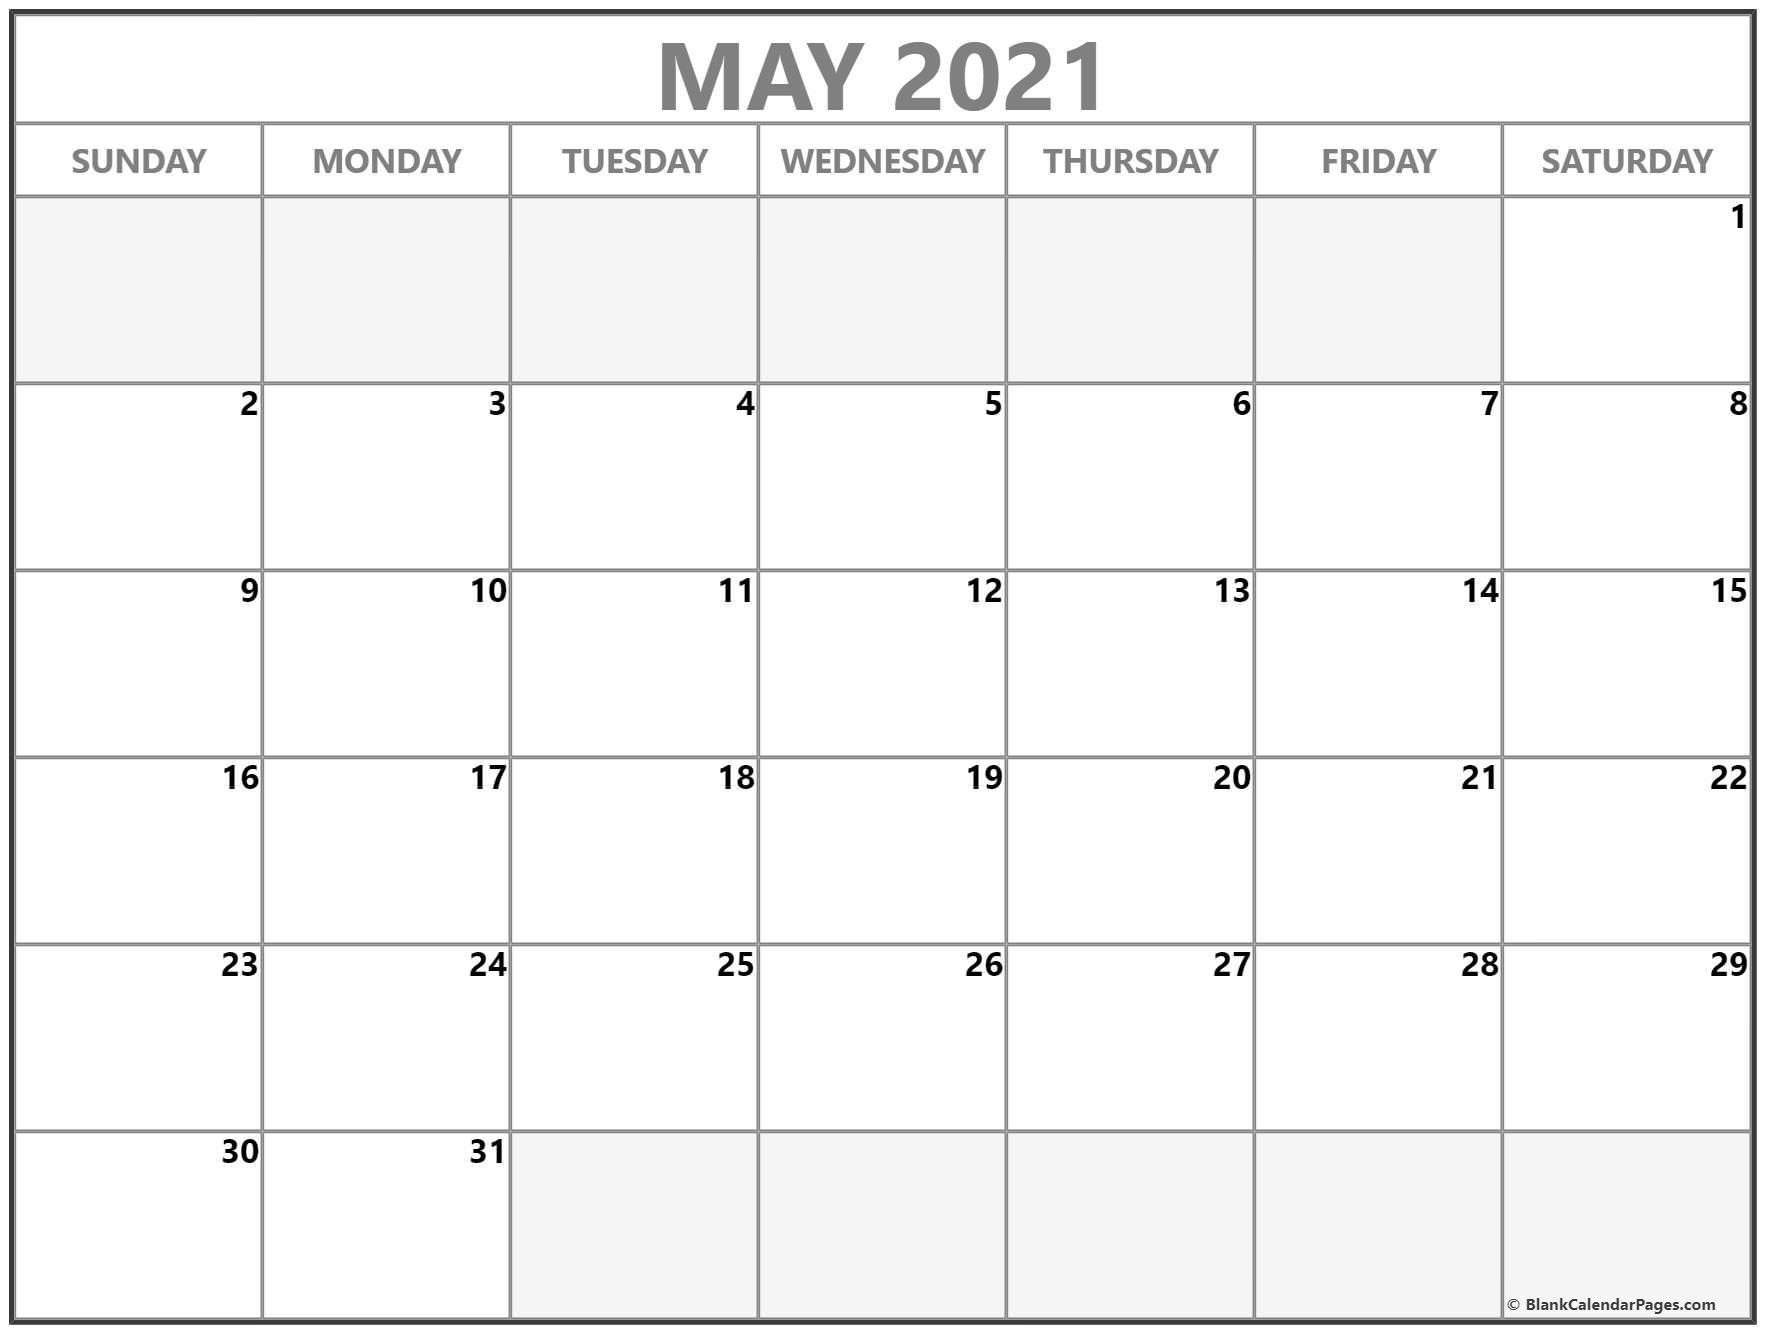 May 2021 Calendar | Free Printable Calendar Templates